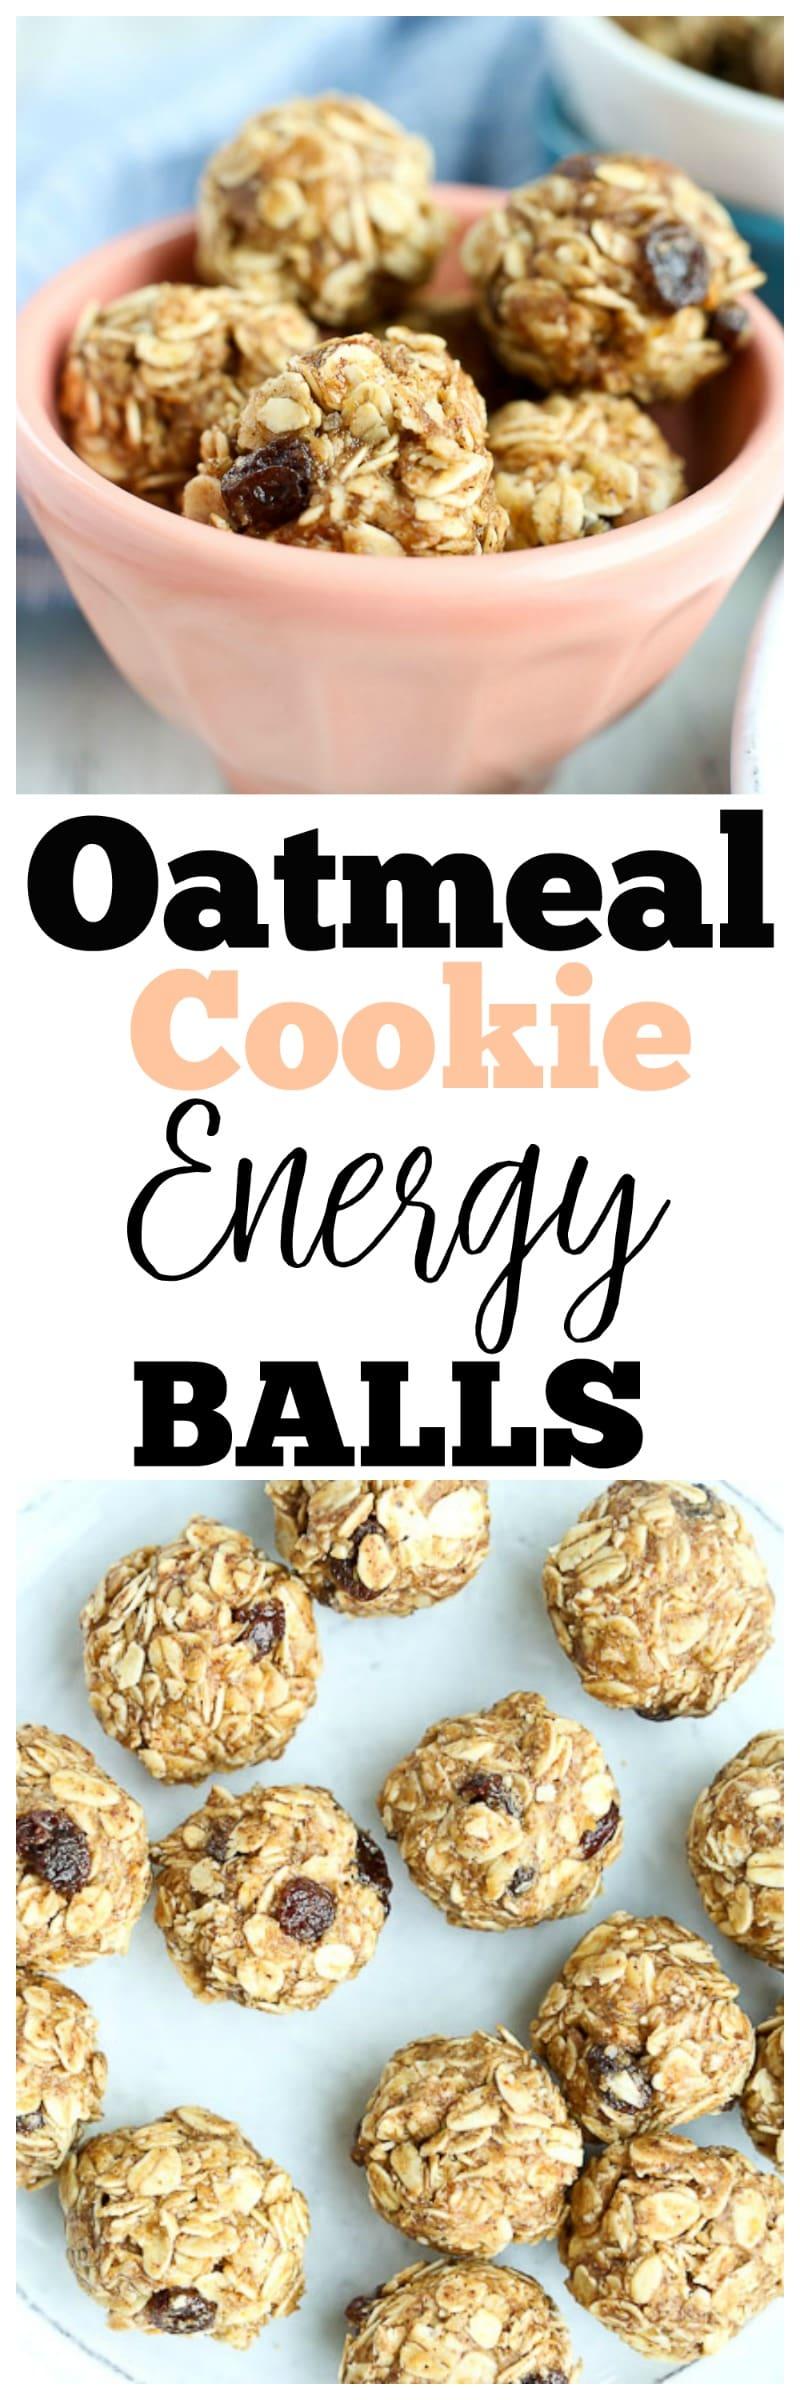 Oatmeal Cookie Energy Balls Recipe | healthy snack ideas | kid-friendly snack | gluten-free snacks | dairy-free snacks